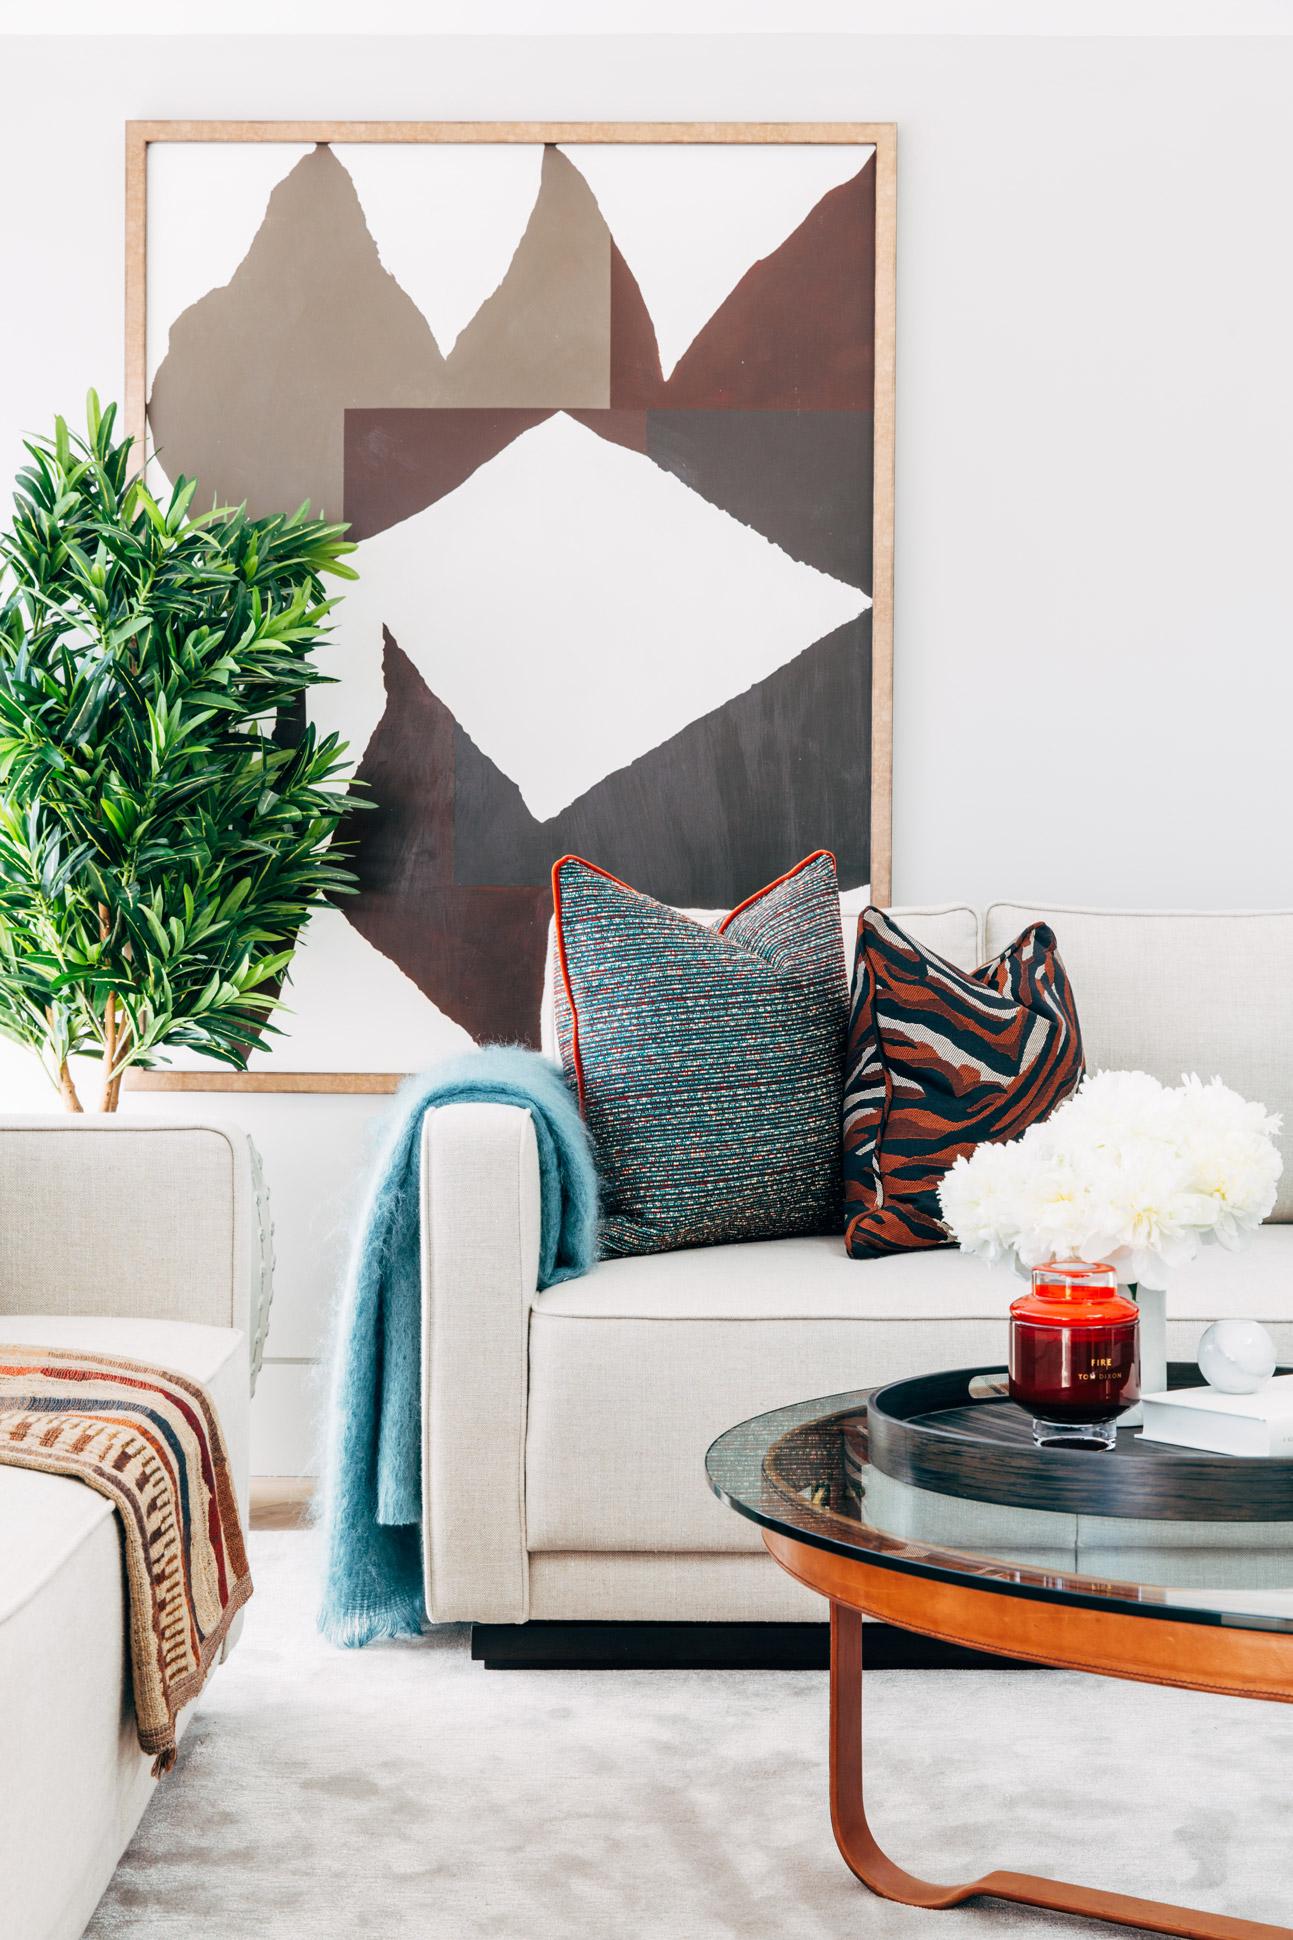 A_LONDON_02_Living_Room.jpg